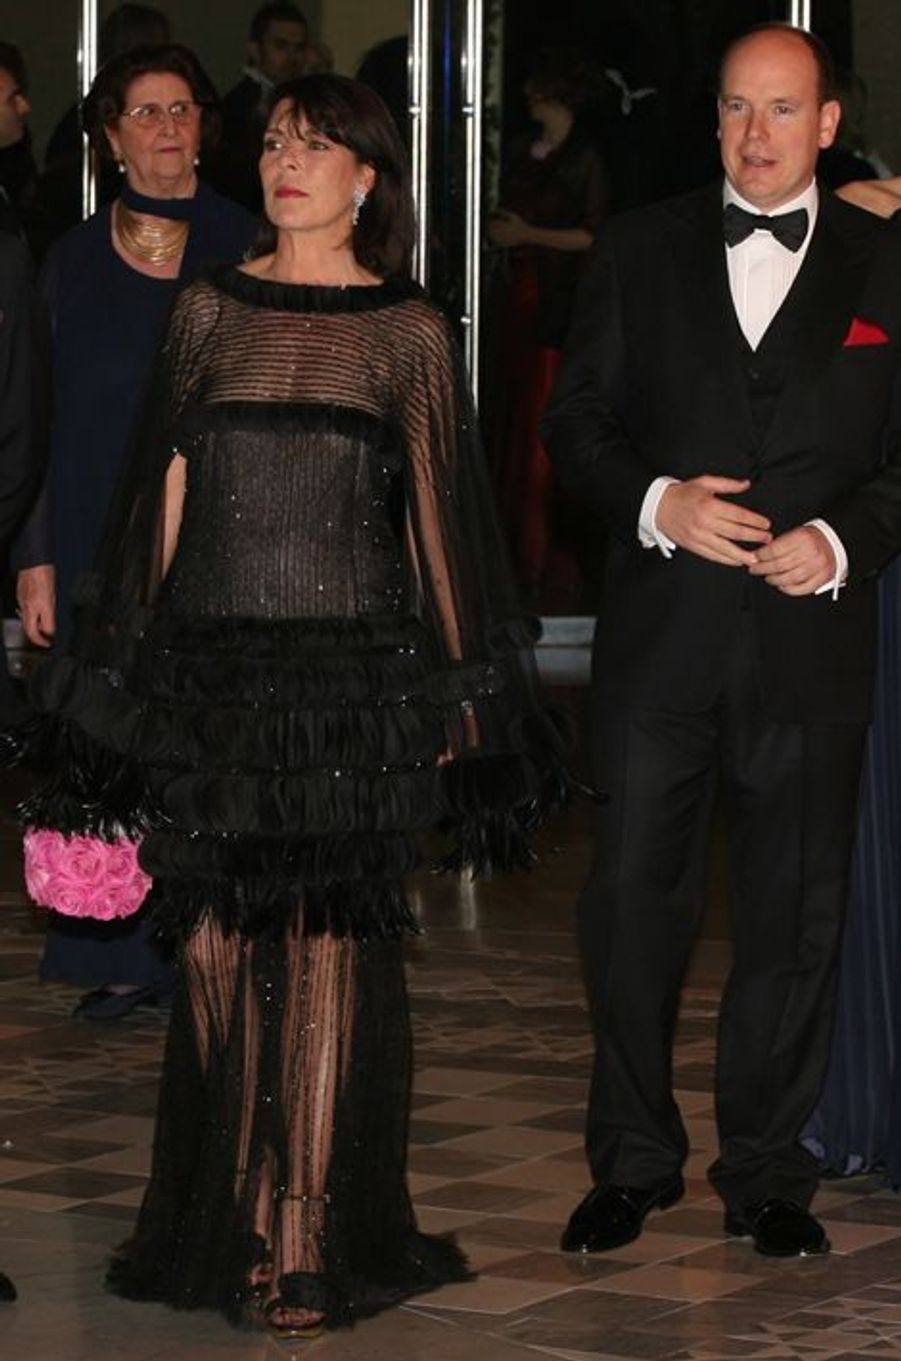 La princesse Caroline de Monaco au bal de la Rose 2008, avec le prince Albert II